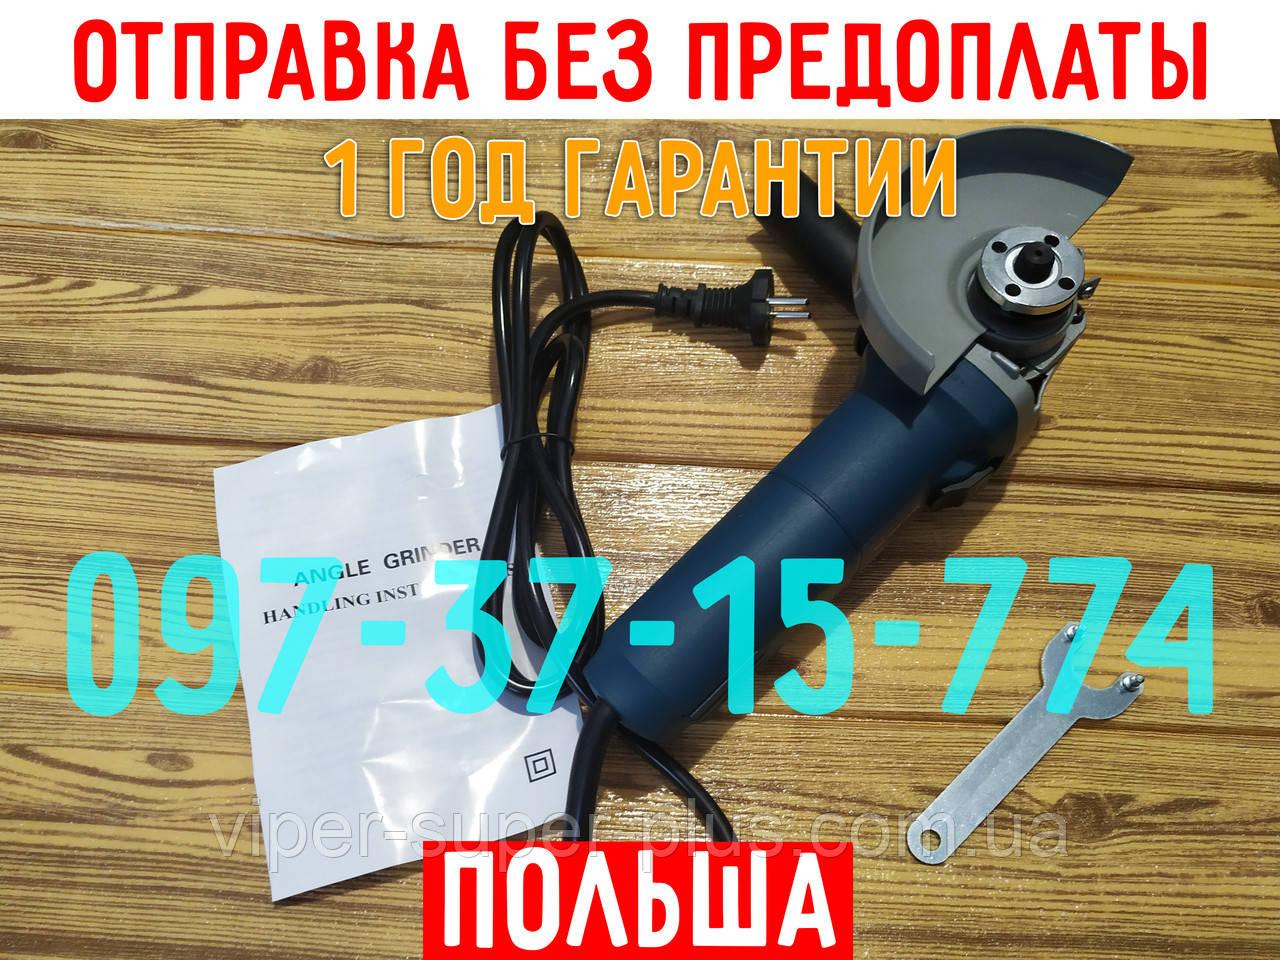 Електрична Кутова Шліфувальна Машина Boshun BS6125-B012 | ПОЛЬЩА | ДО 125 мм 4 1/2 дюйма | Бошун Б012